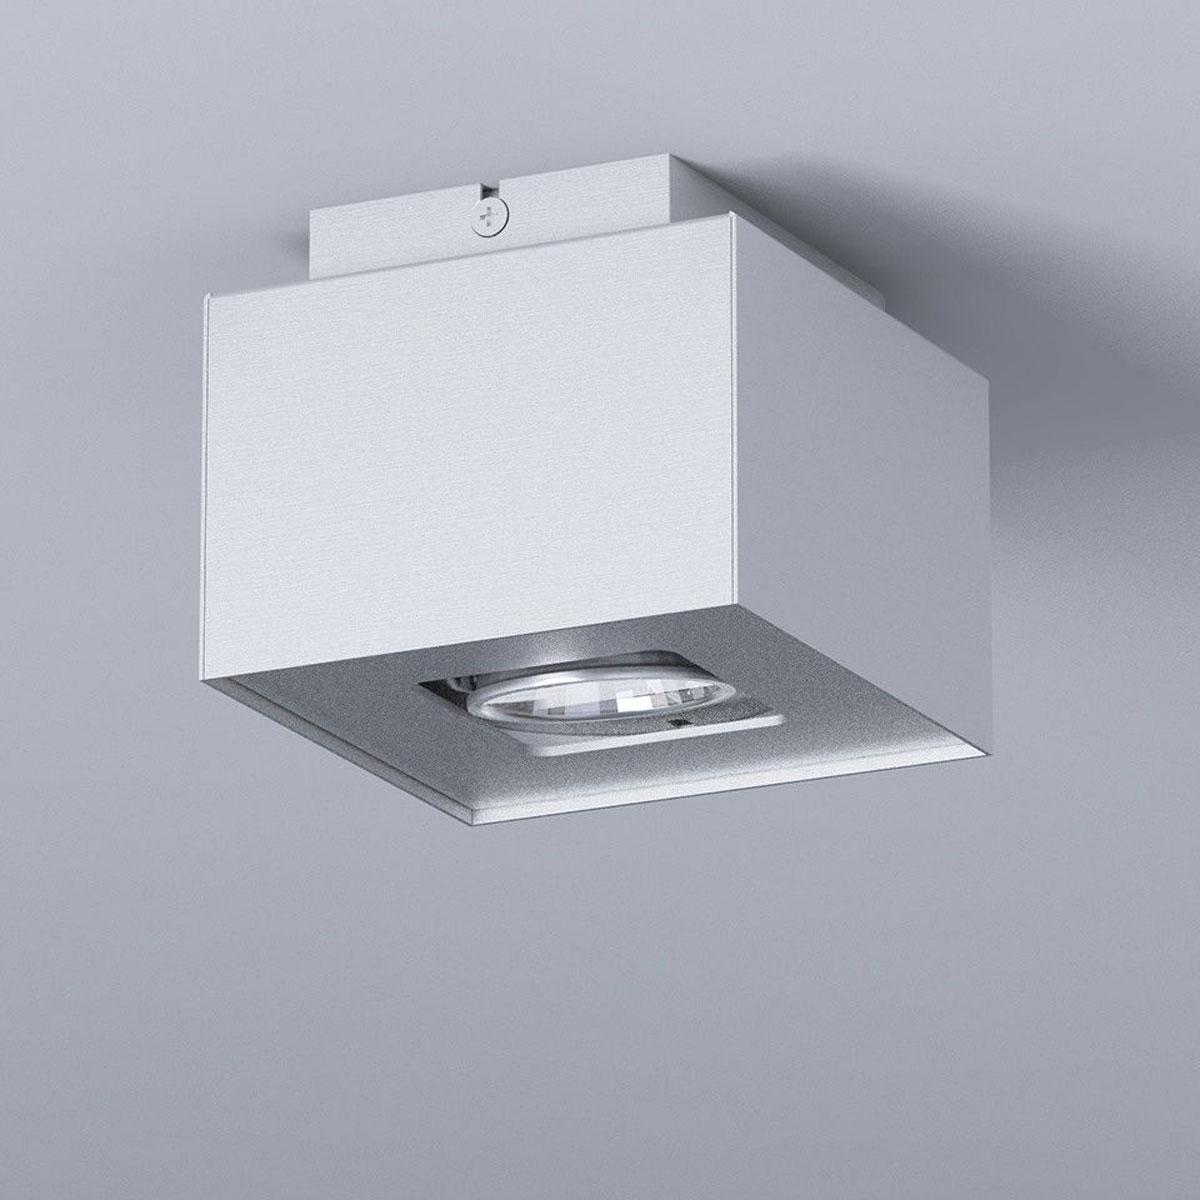 philips myliving tempo spot aluminium 1 spot. Black Bedroom Furniture Sets. Home Design Ideas